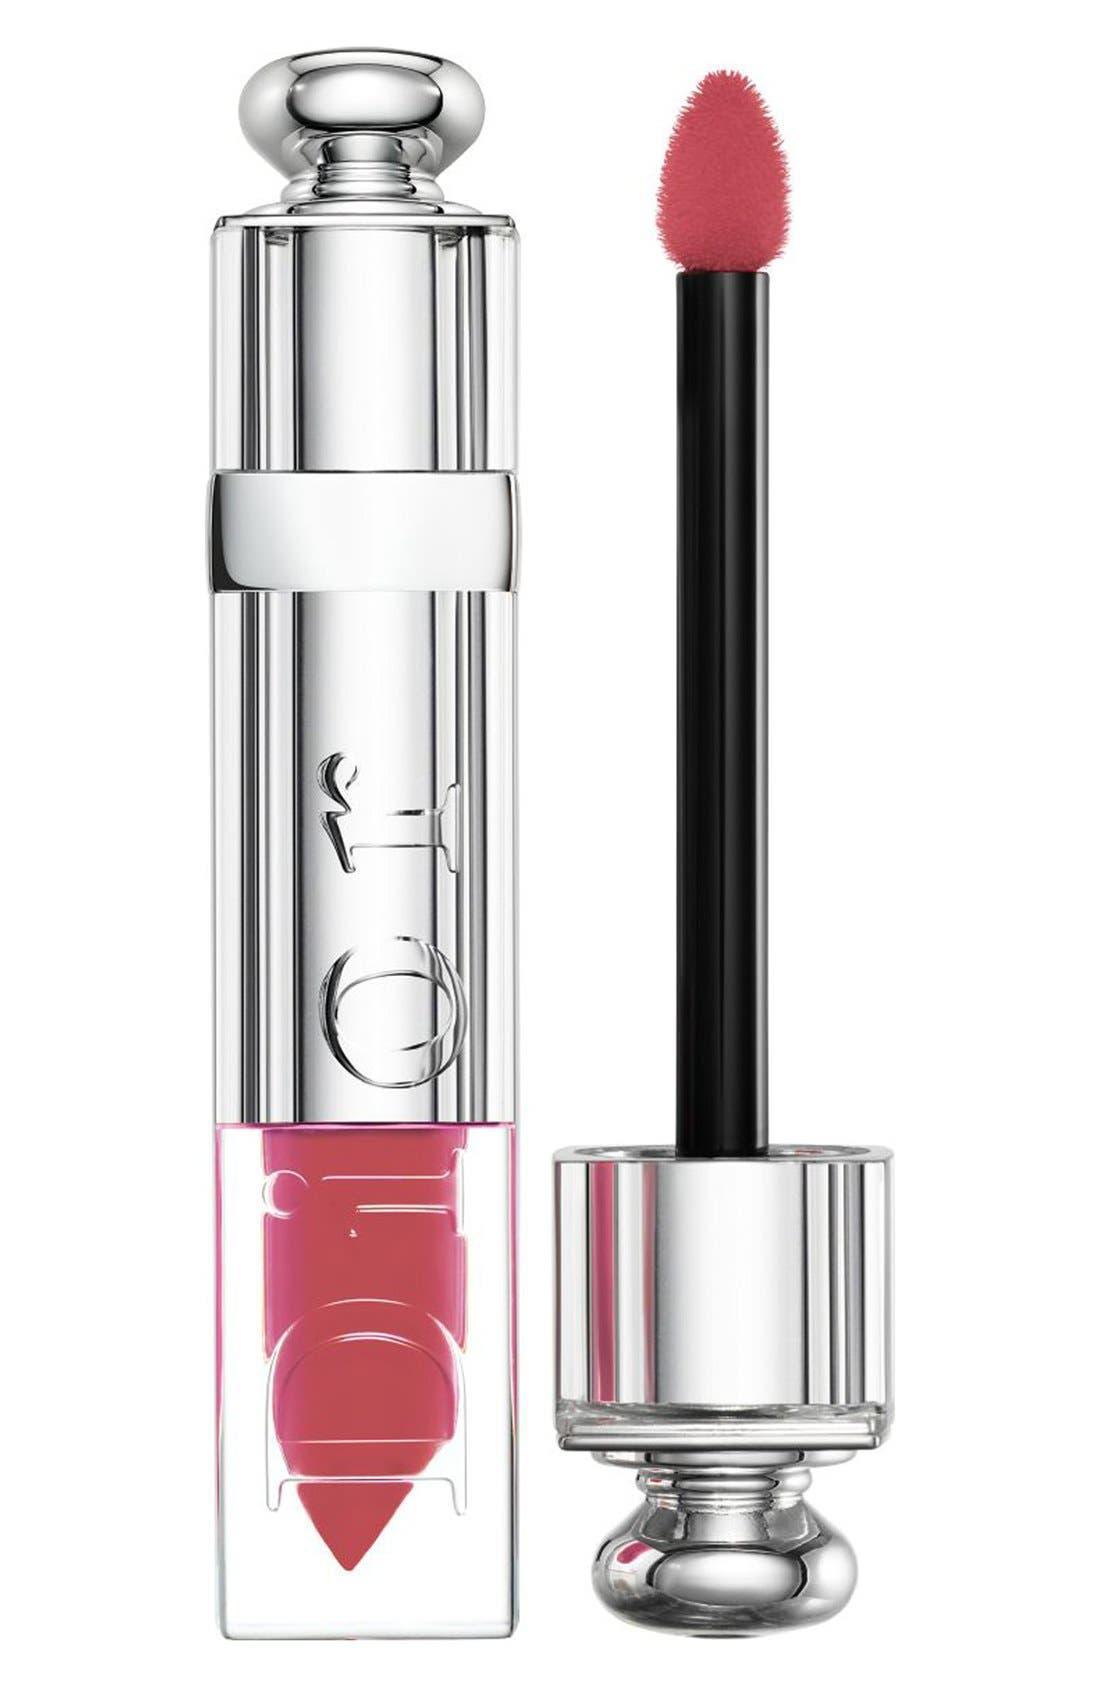 Dior 'Addict' Fluid Stick